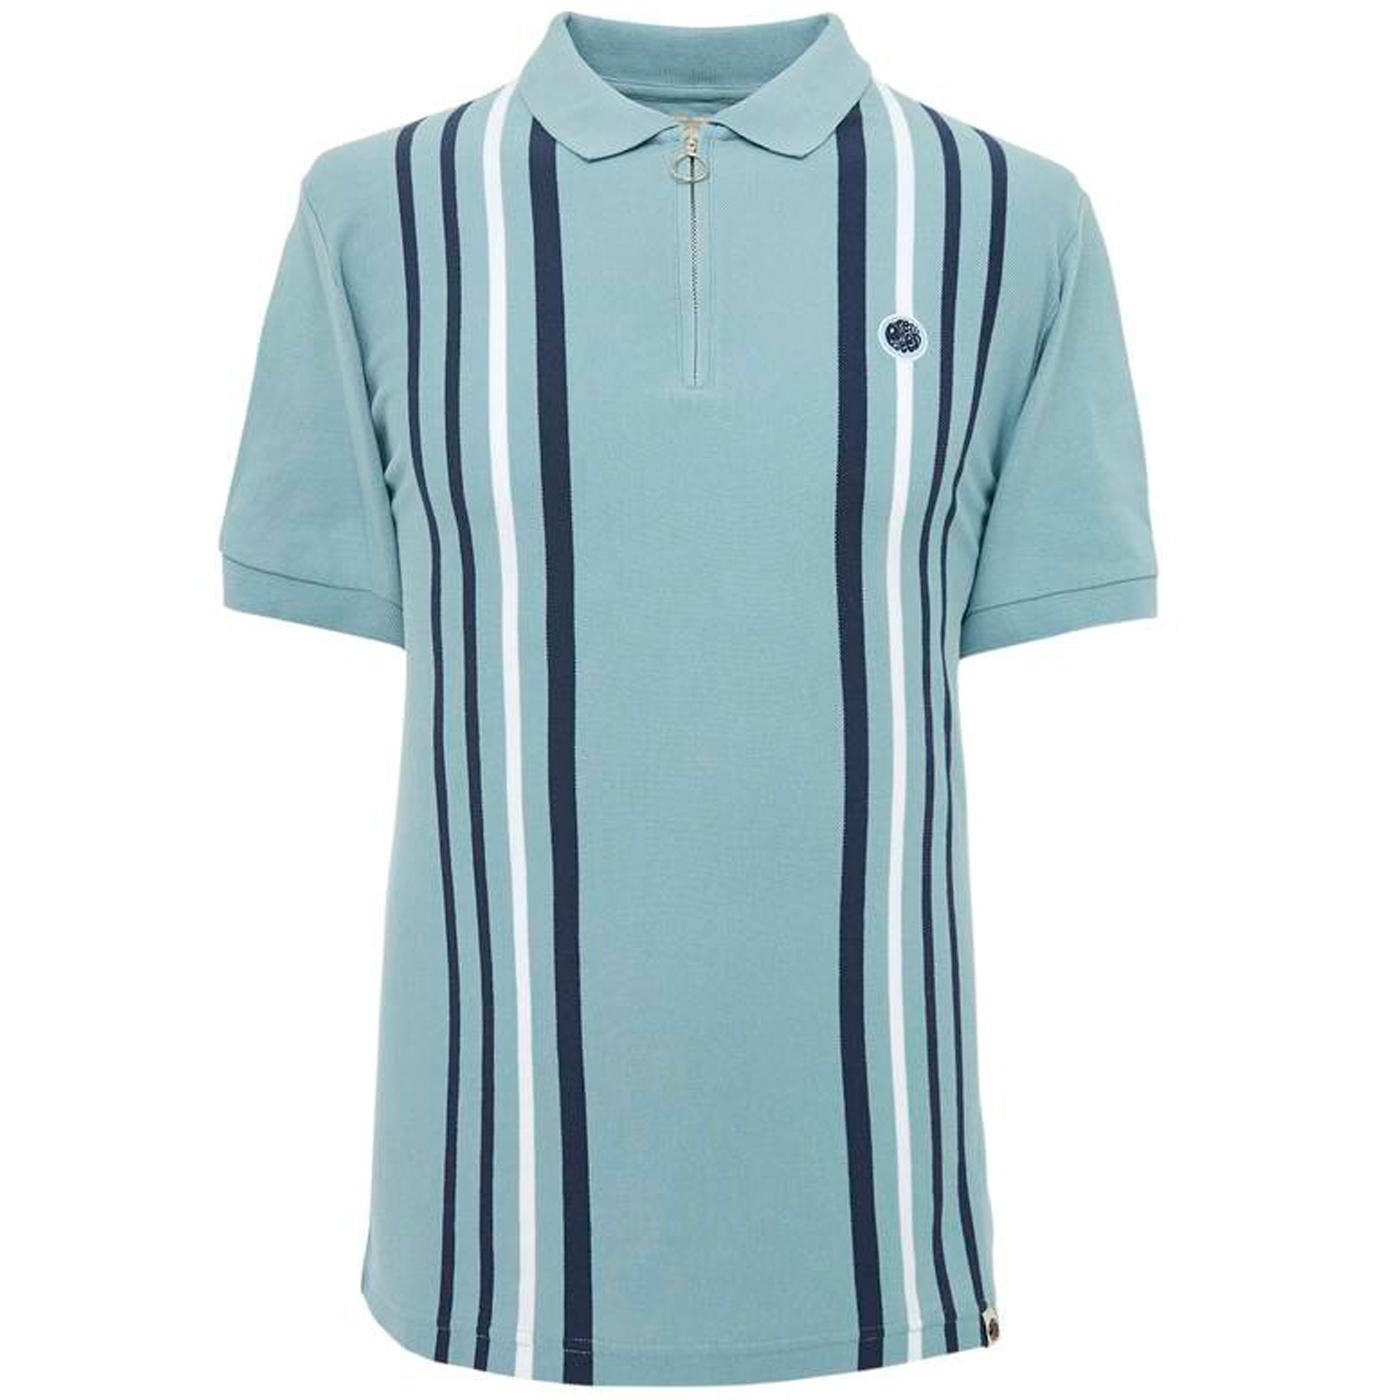 PRETTY GREEN Mod Vertical Stripe Zip Neck Polo Top